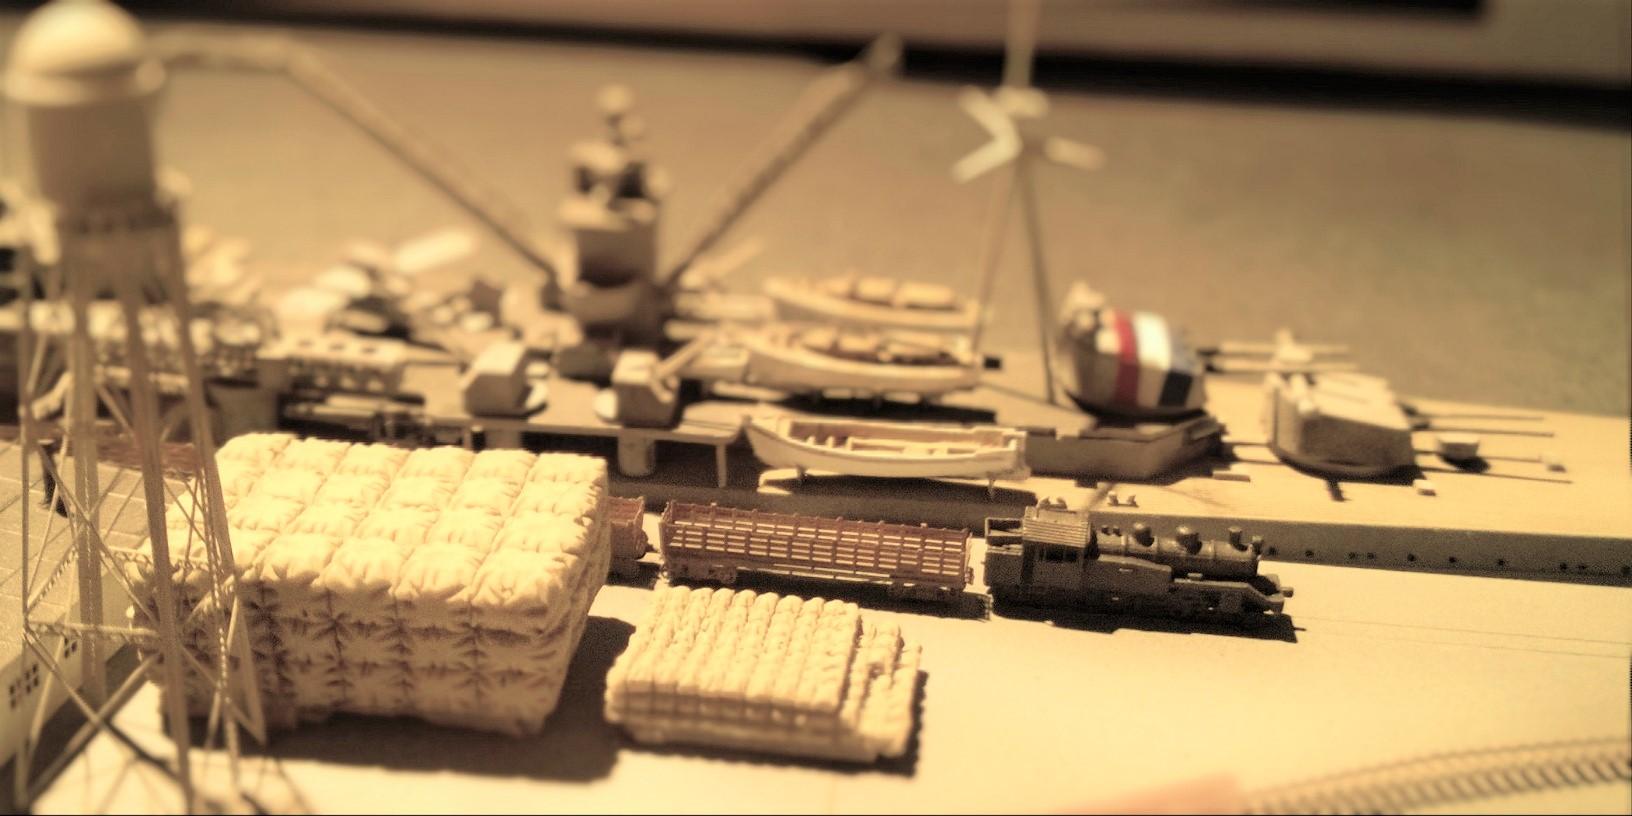 Diorama base navale 1/700 par Nesquik - Page 4 GCGf0